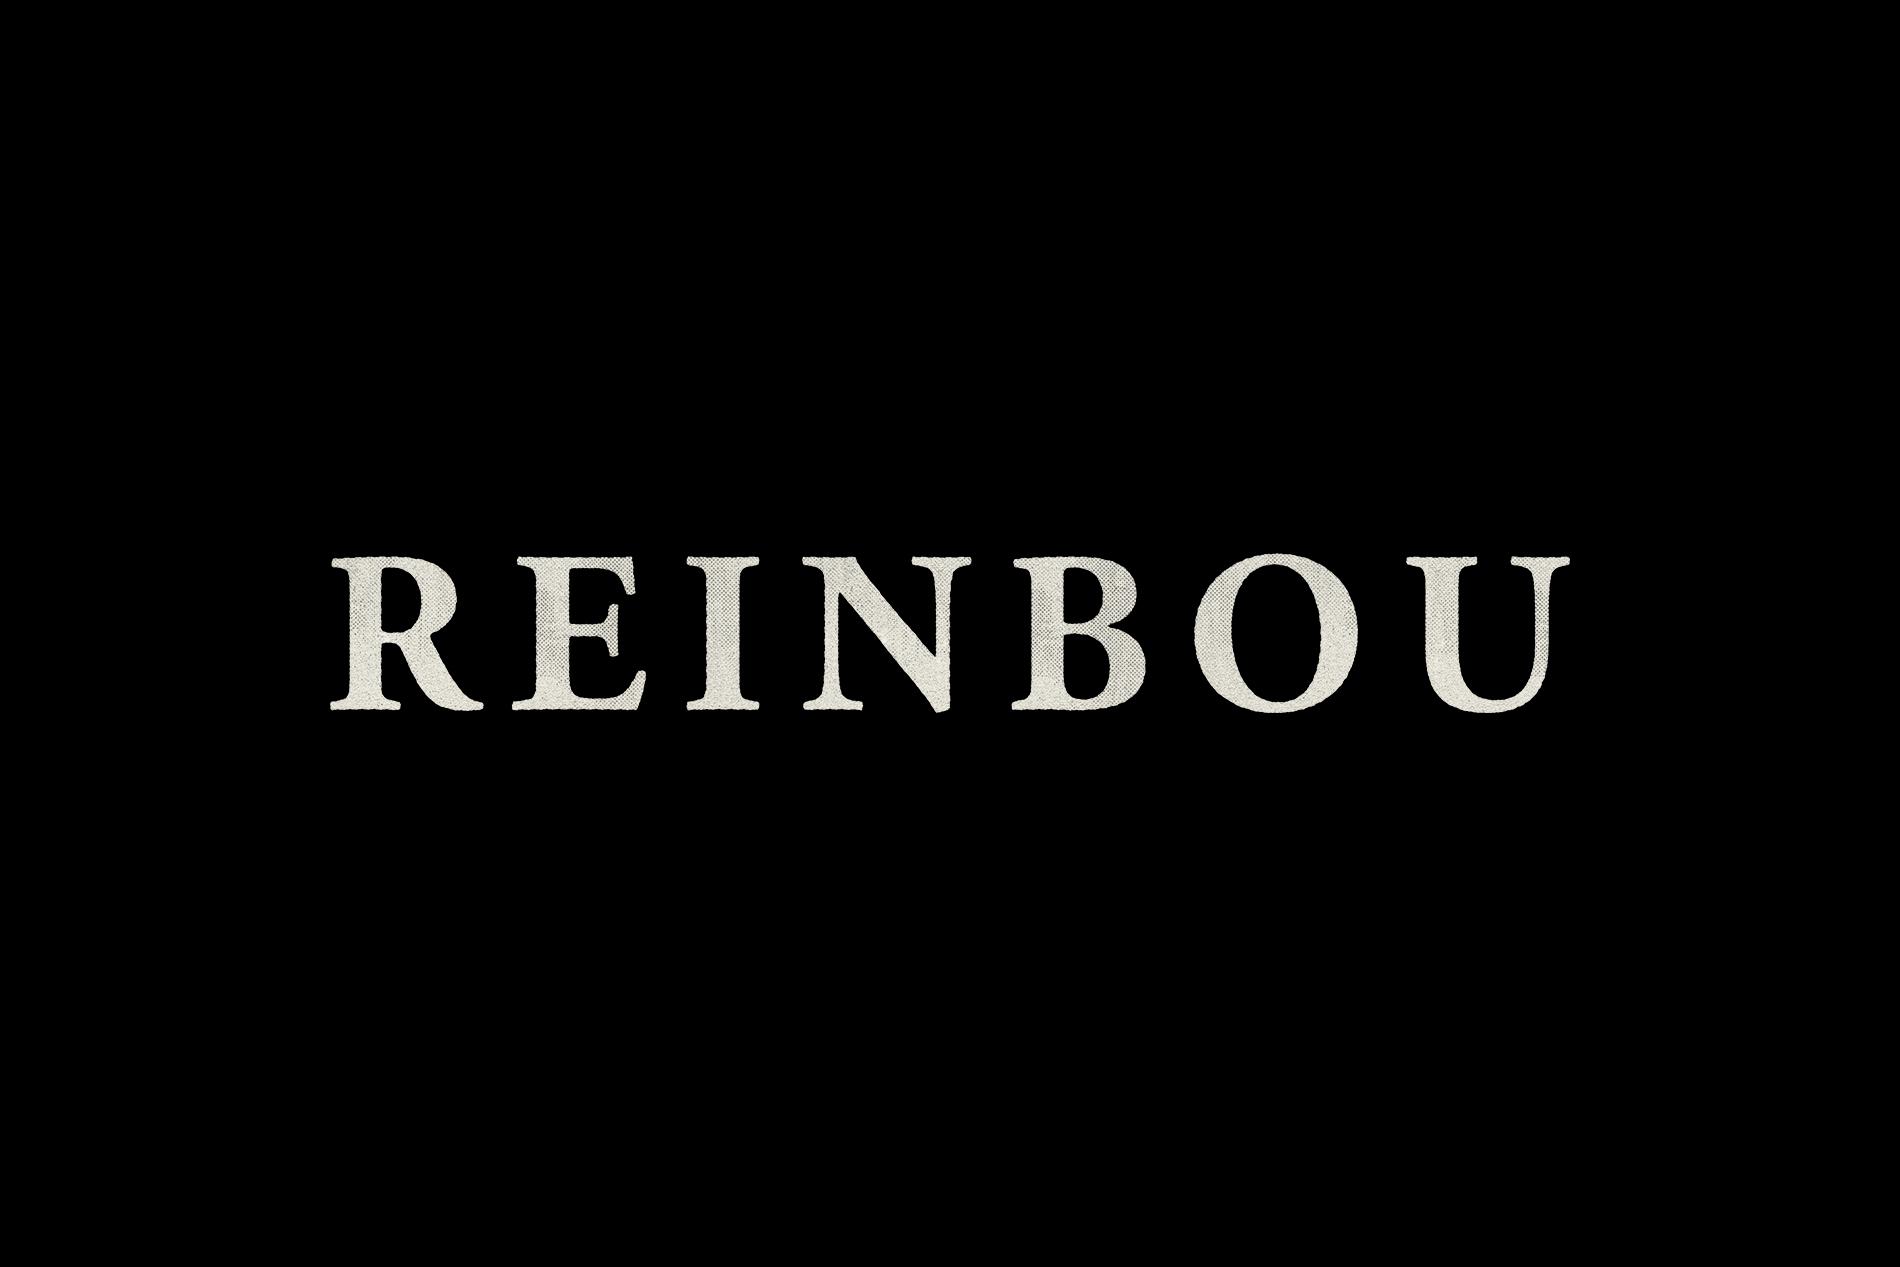 Reinbou_Project2_Reinbou.jpg